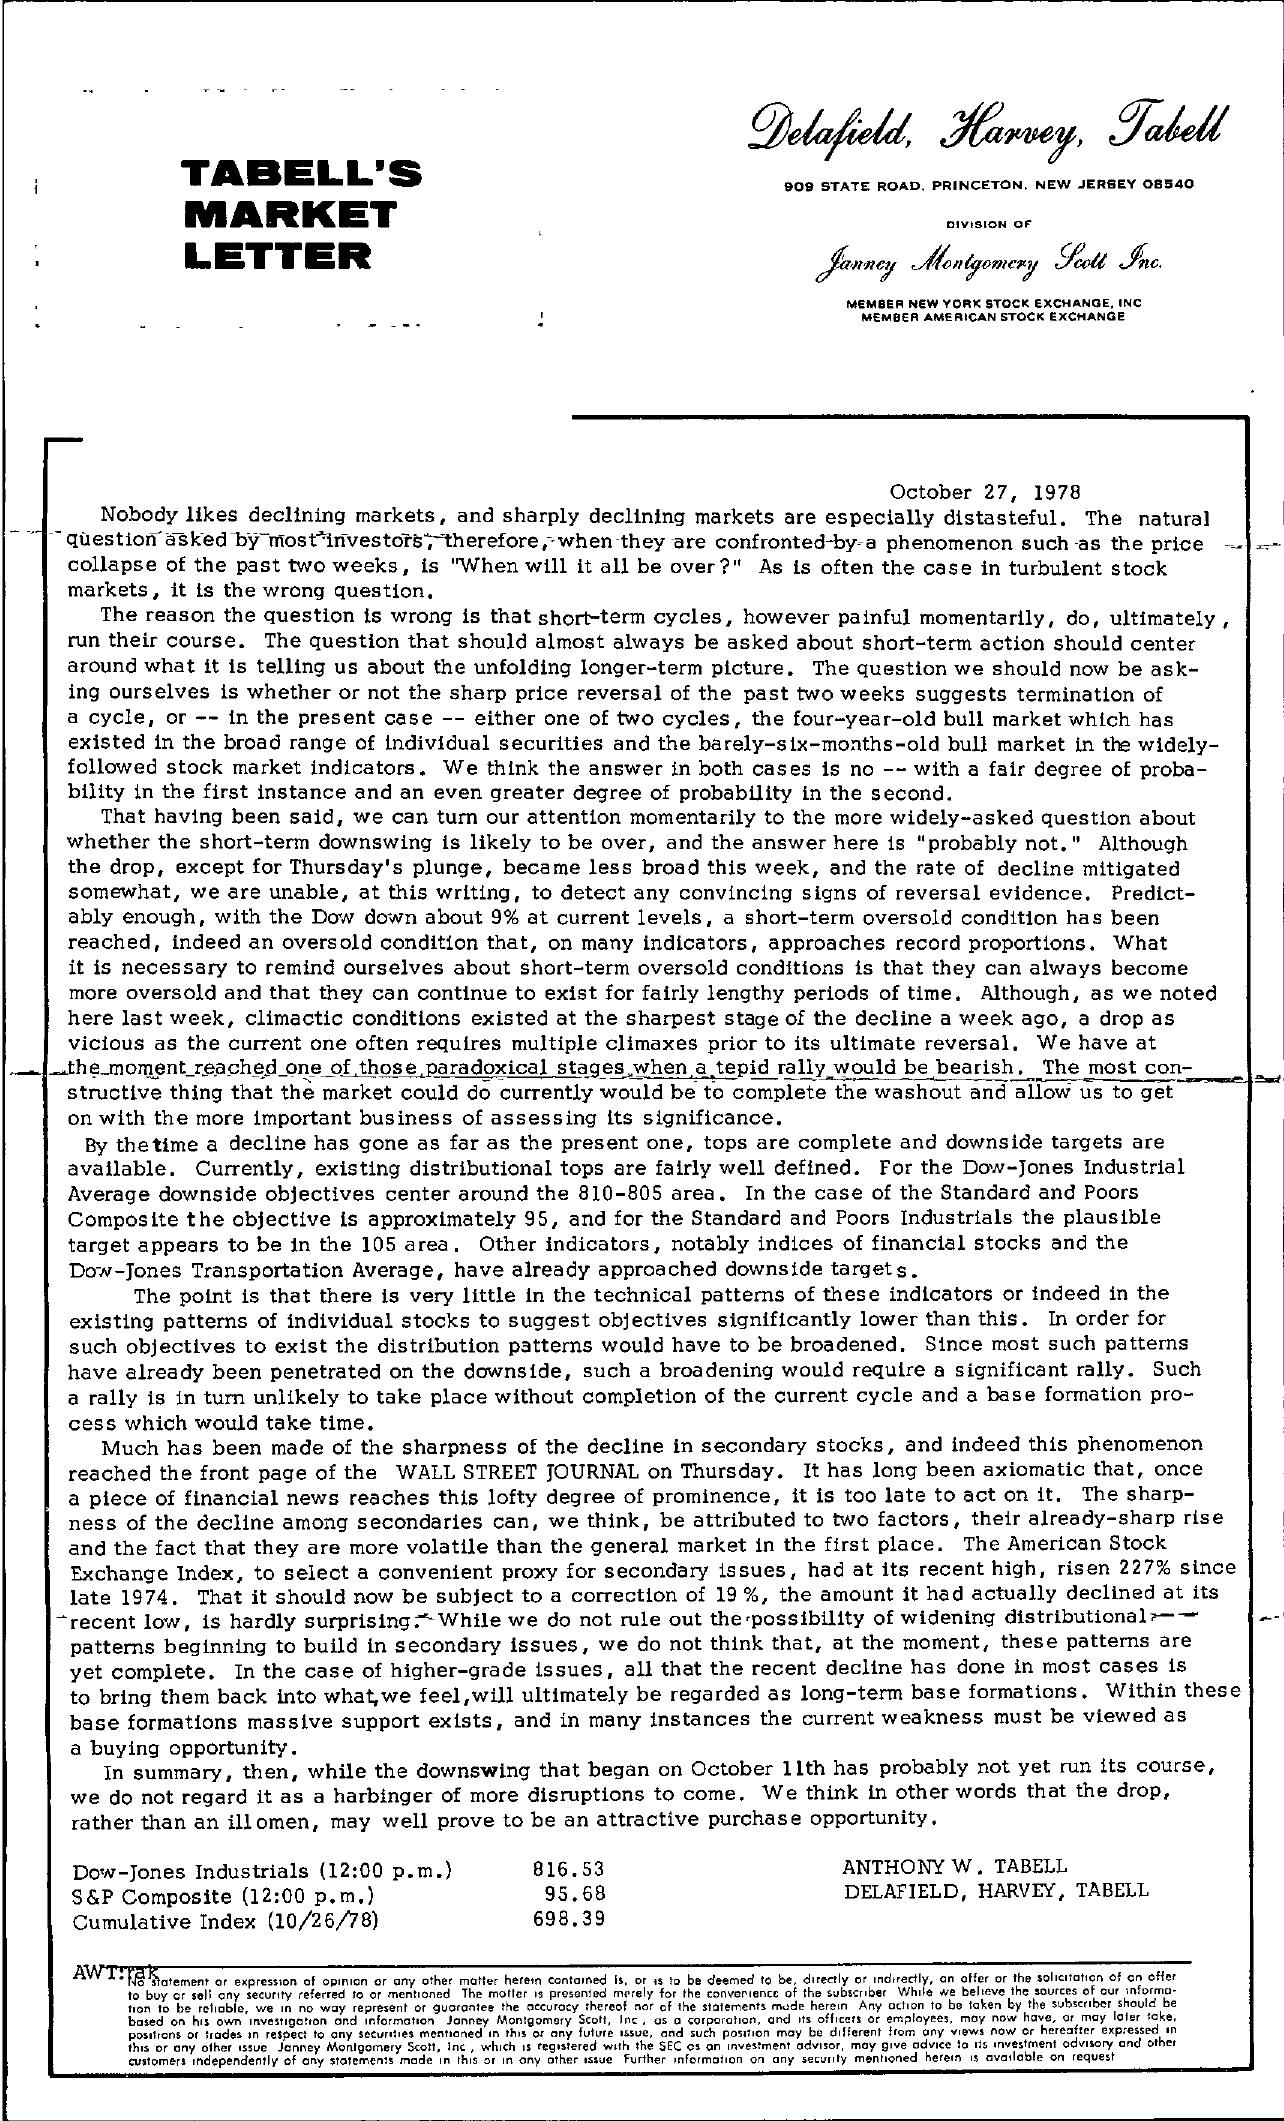 Tabell's Market Letter - October 27, 1978